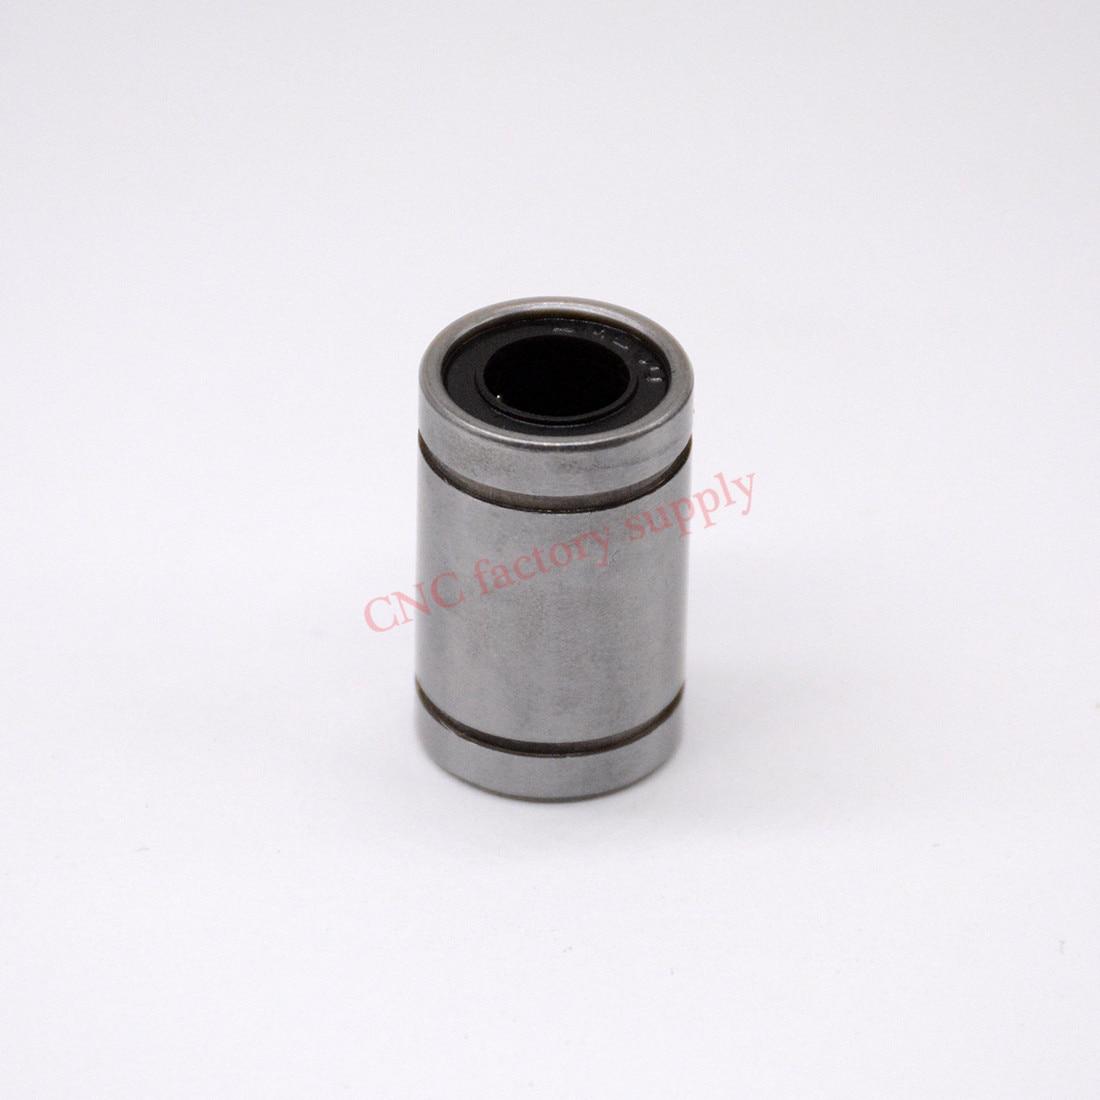 Hot sale  1pc LM6UU Linear Bushing  6mm CNC Linear Bearings hot sale 1pc lm12uu linear bushing 12mm cnc linear bearings